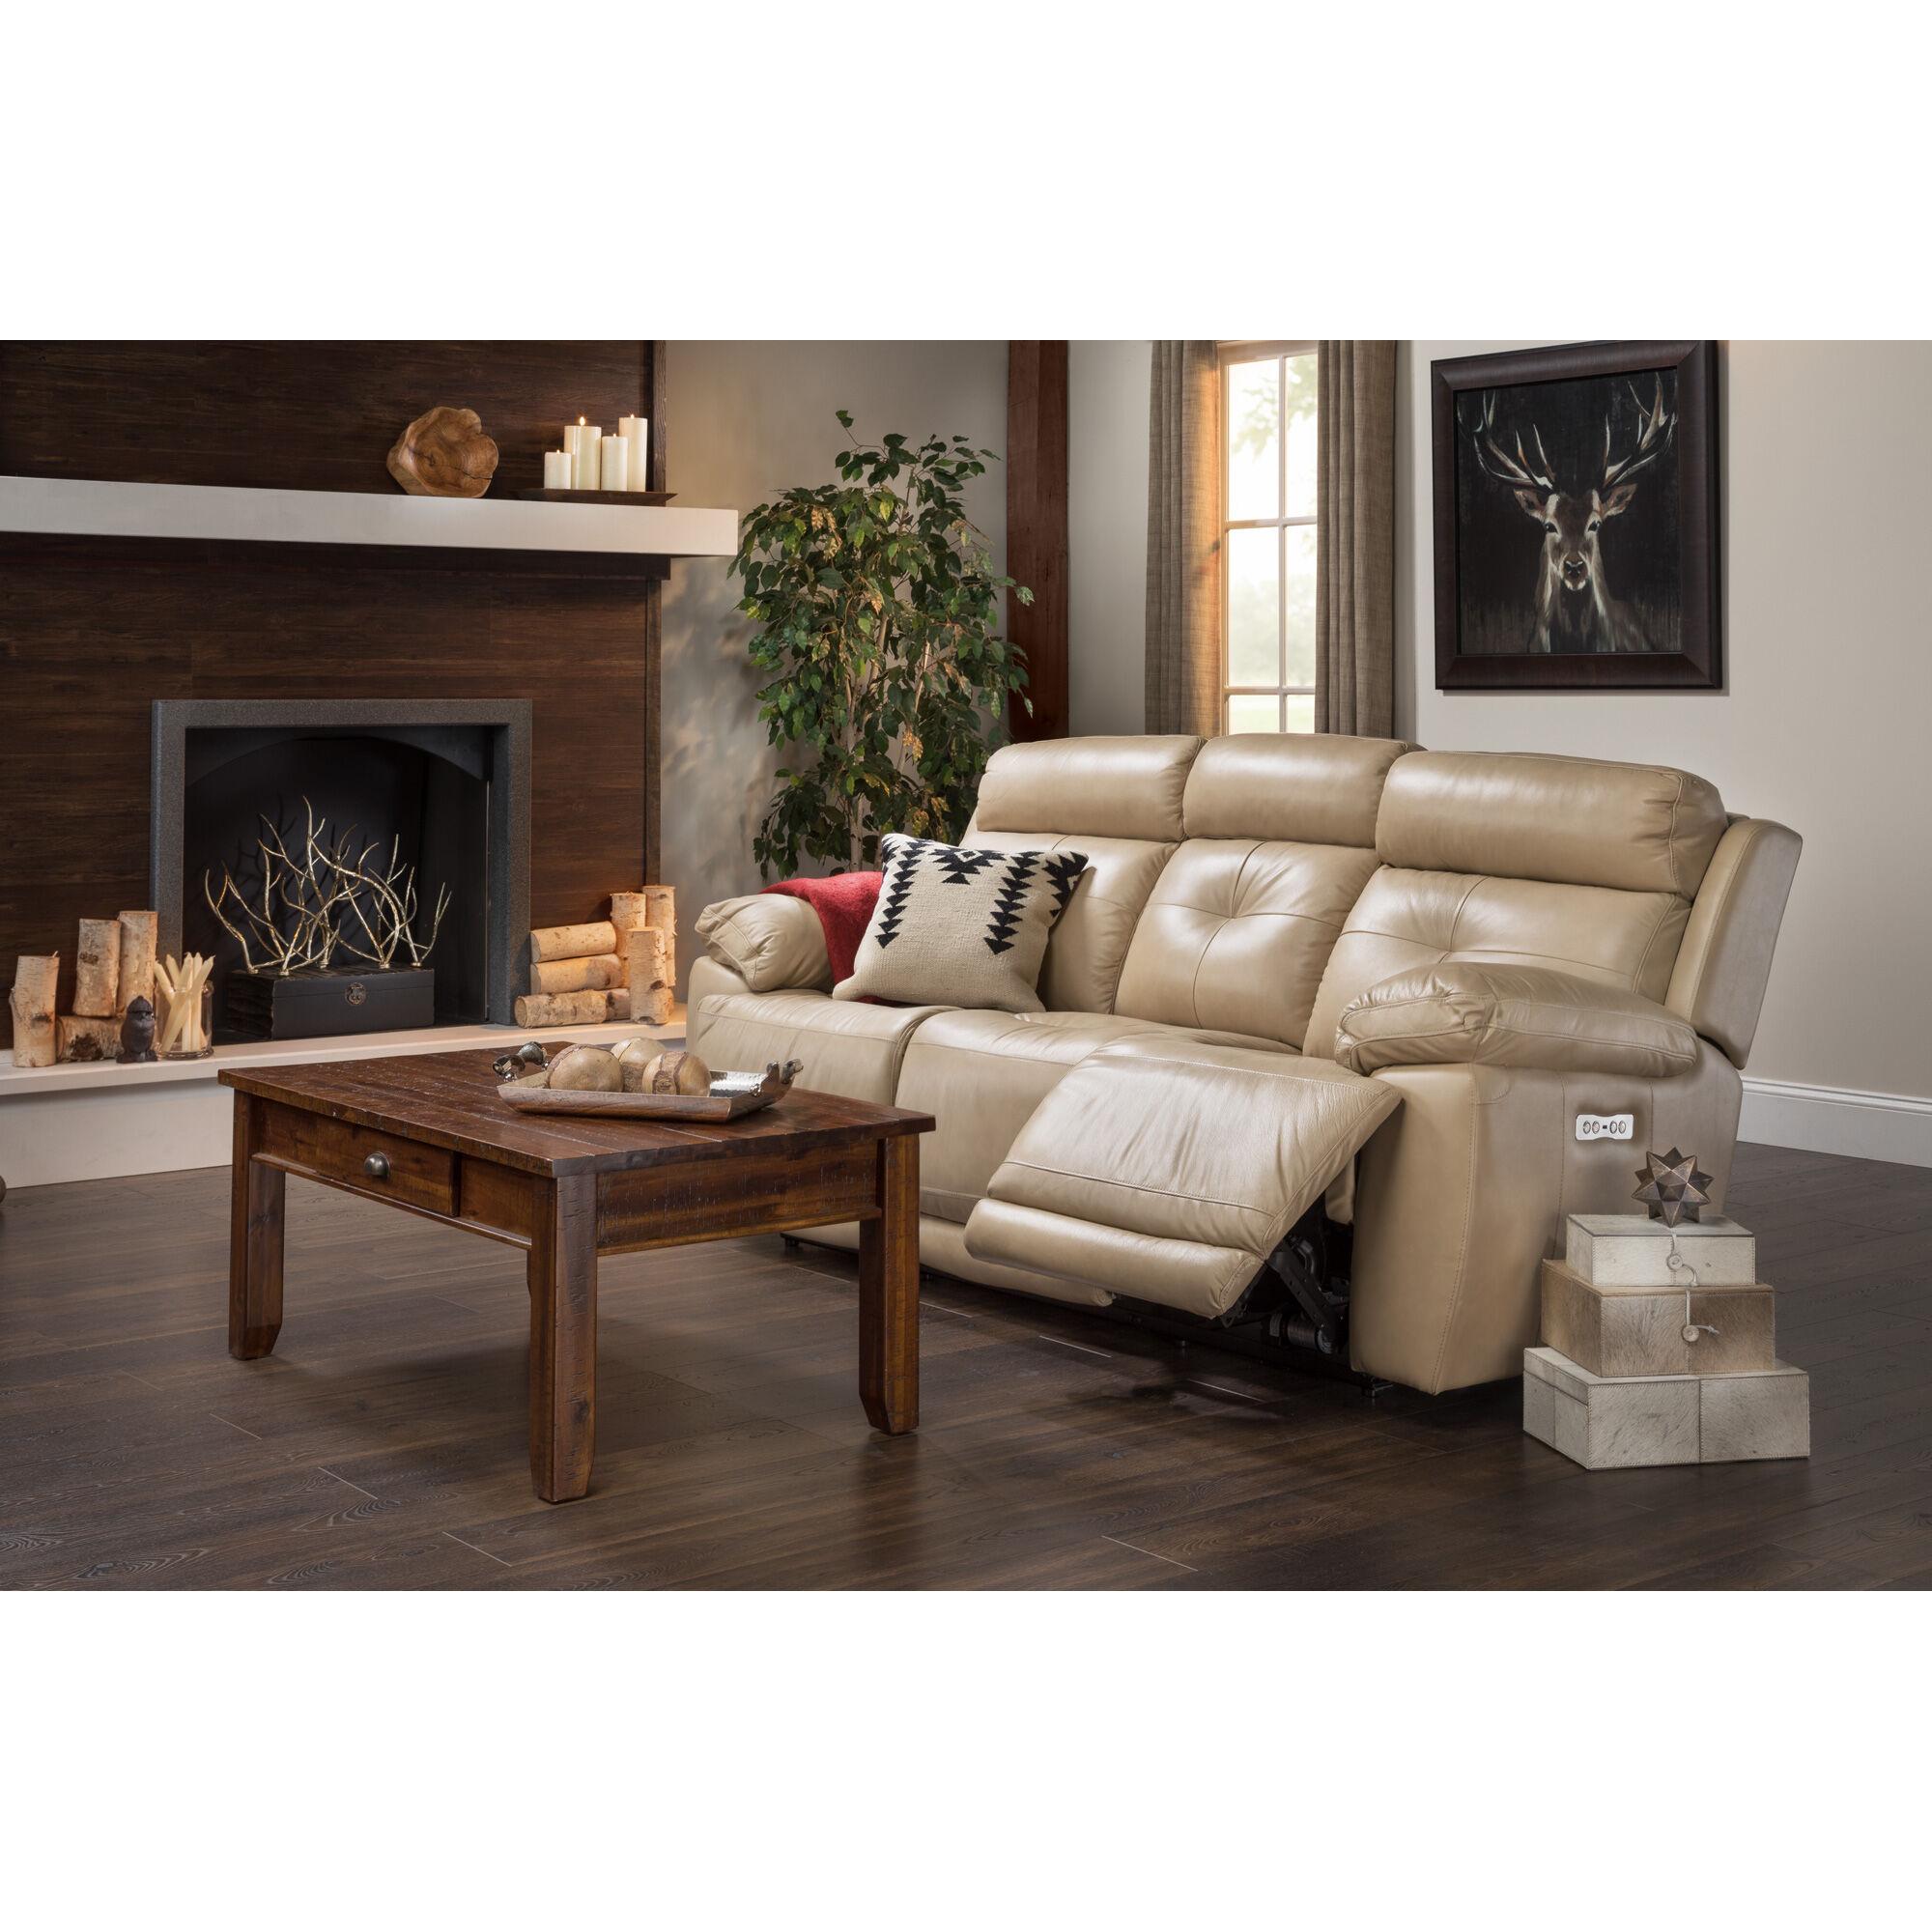 Slumberland Furniture Rhodes Tan Power Reclining Sofa